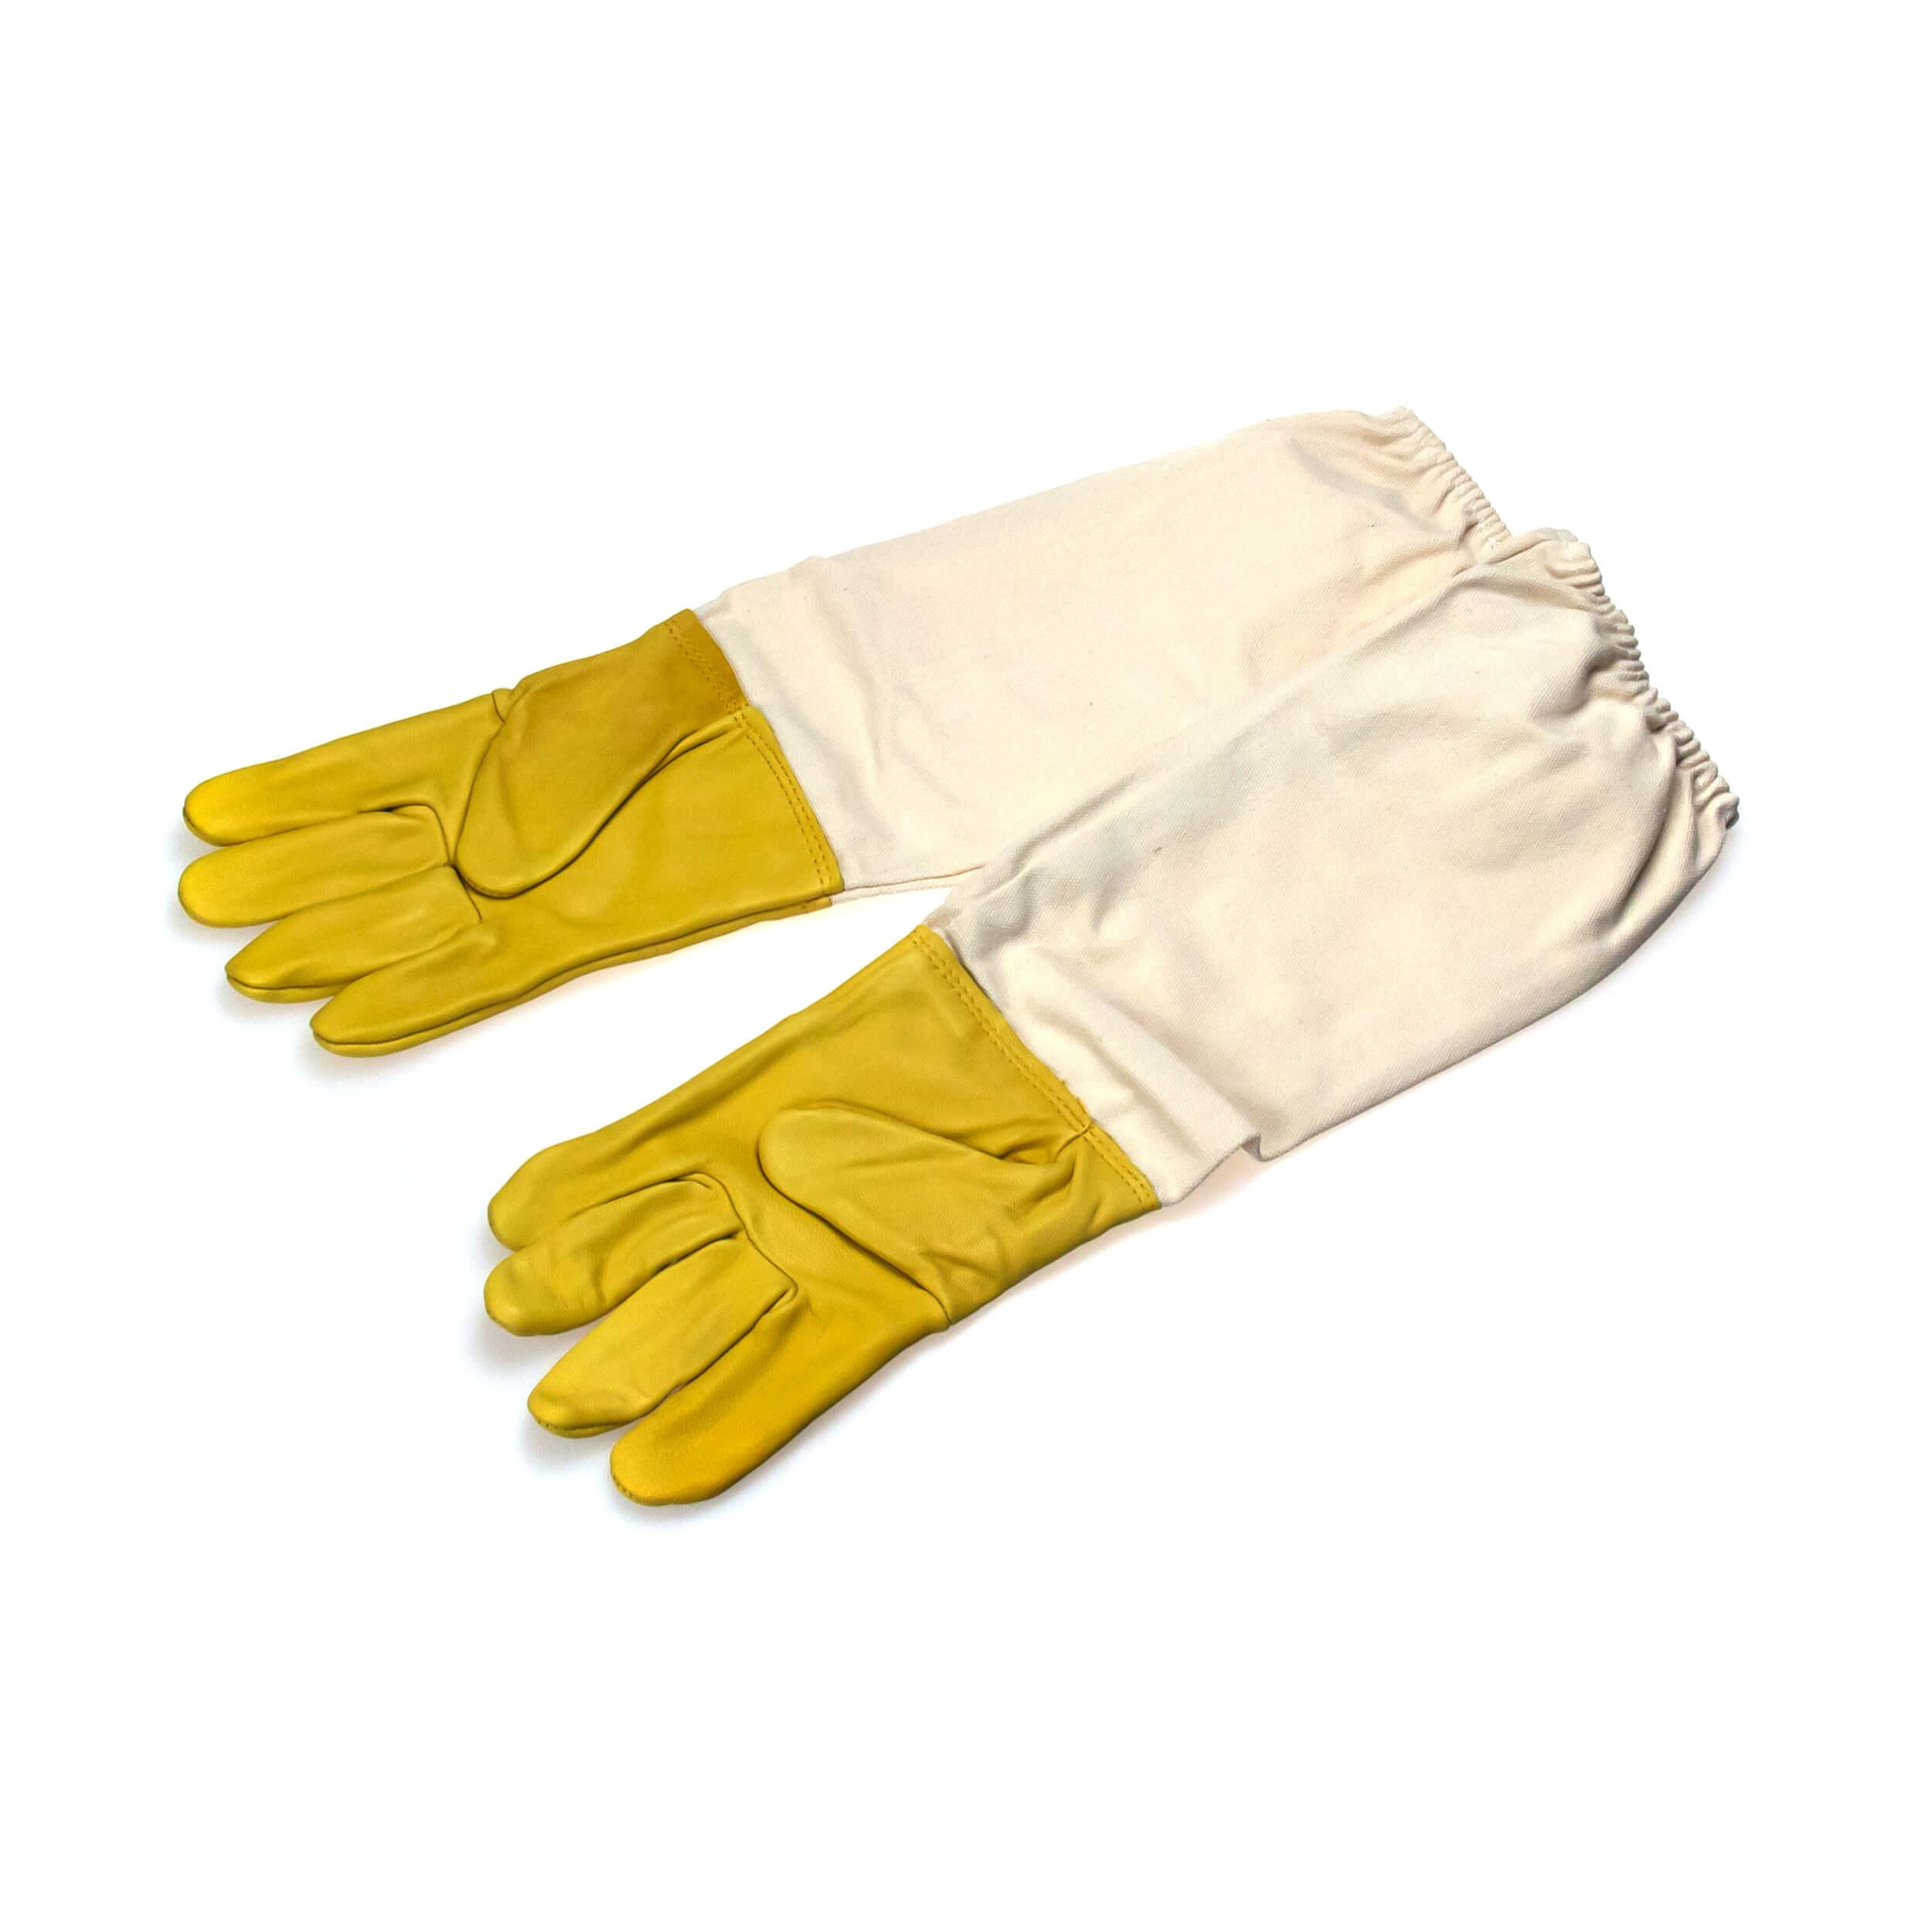 "Перчатки пчеловода ""Api Rugged Leather"" (XL - 11 размер) фото"